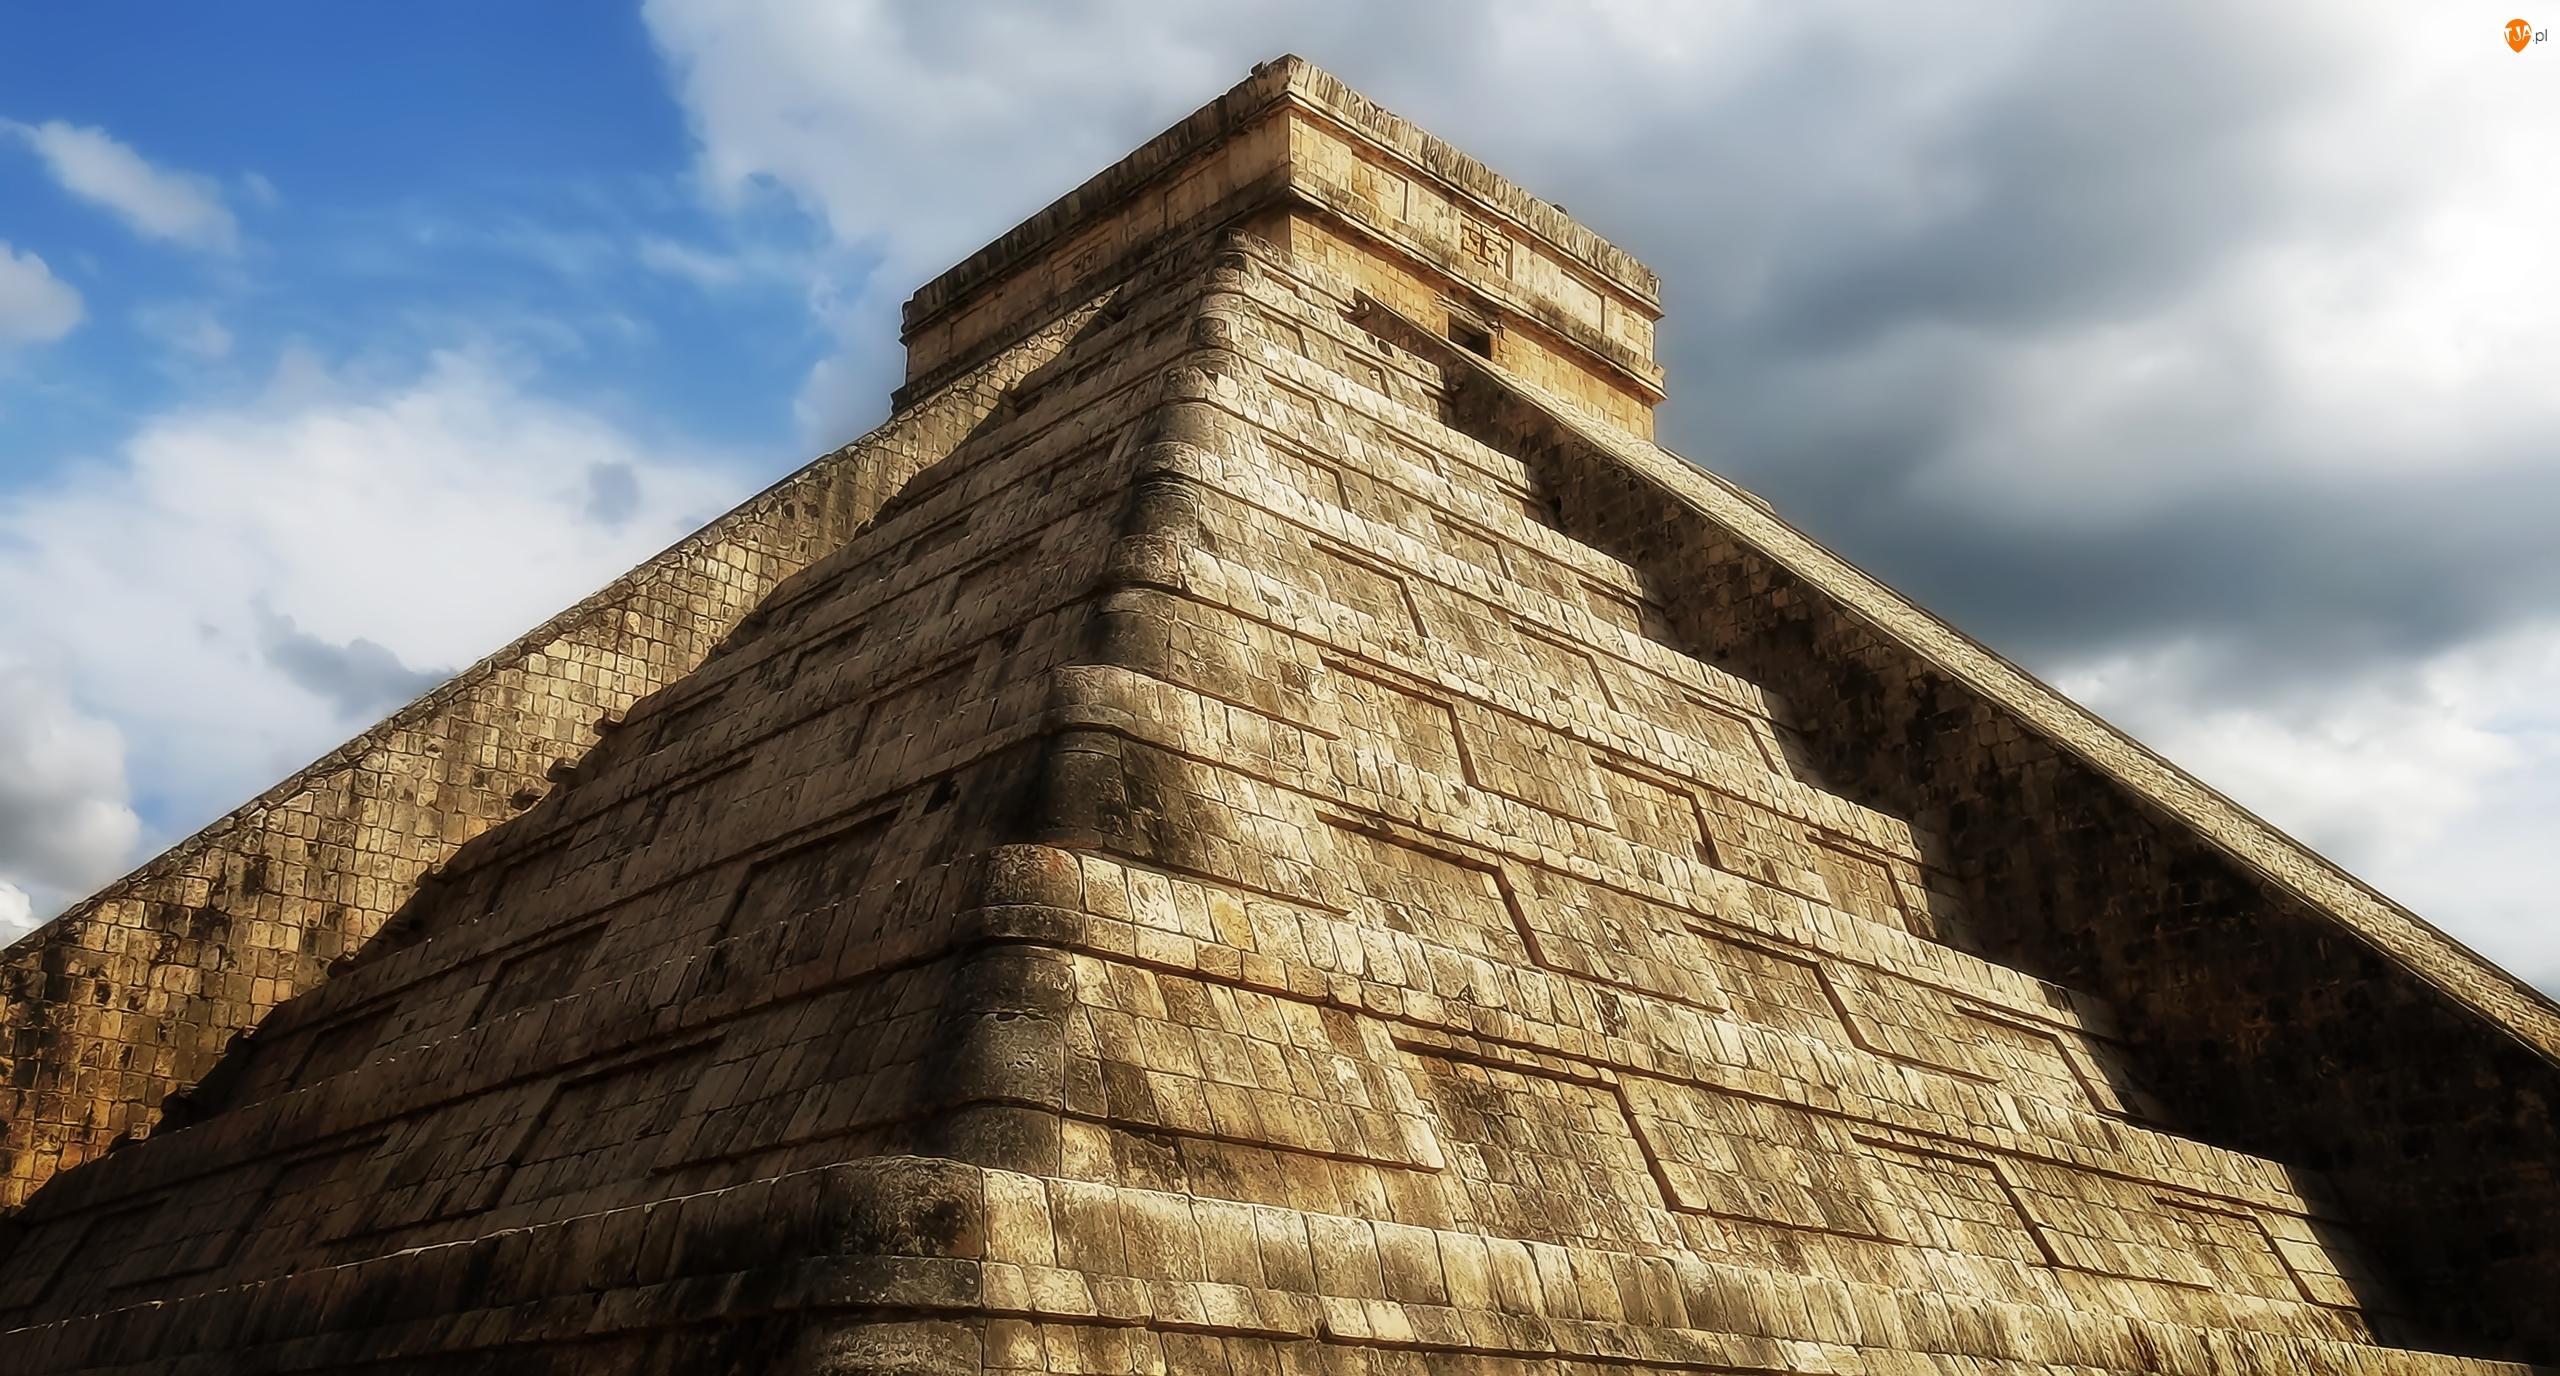 Piramida Kukulkana, Meksyk, Chichén Itzá